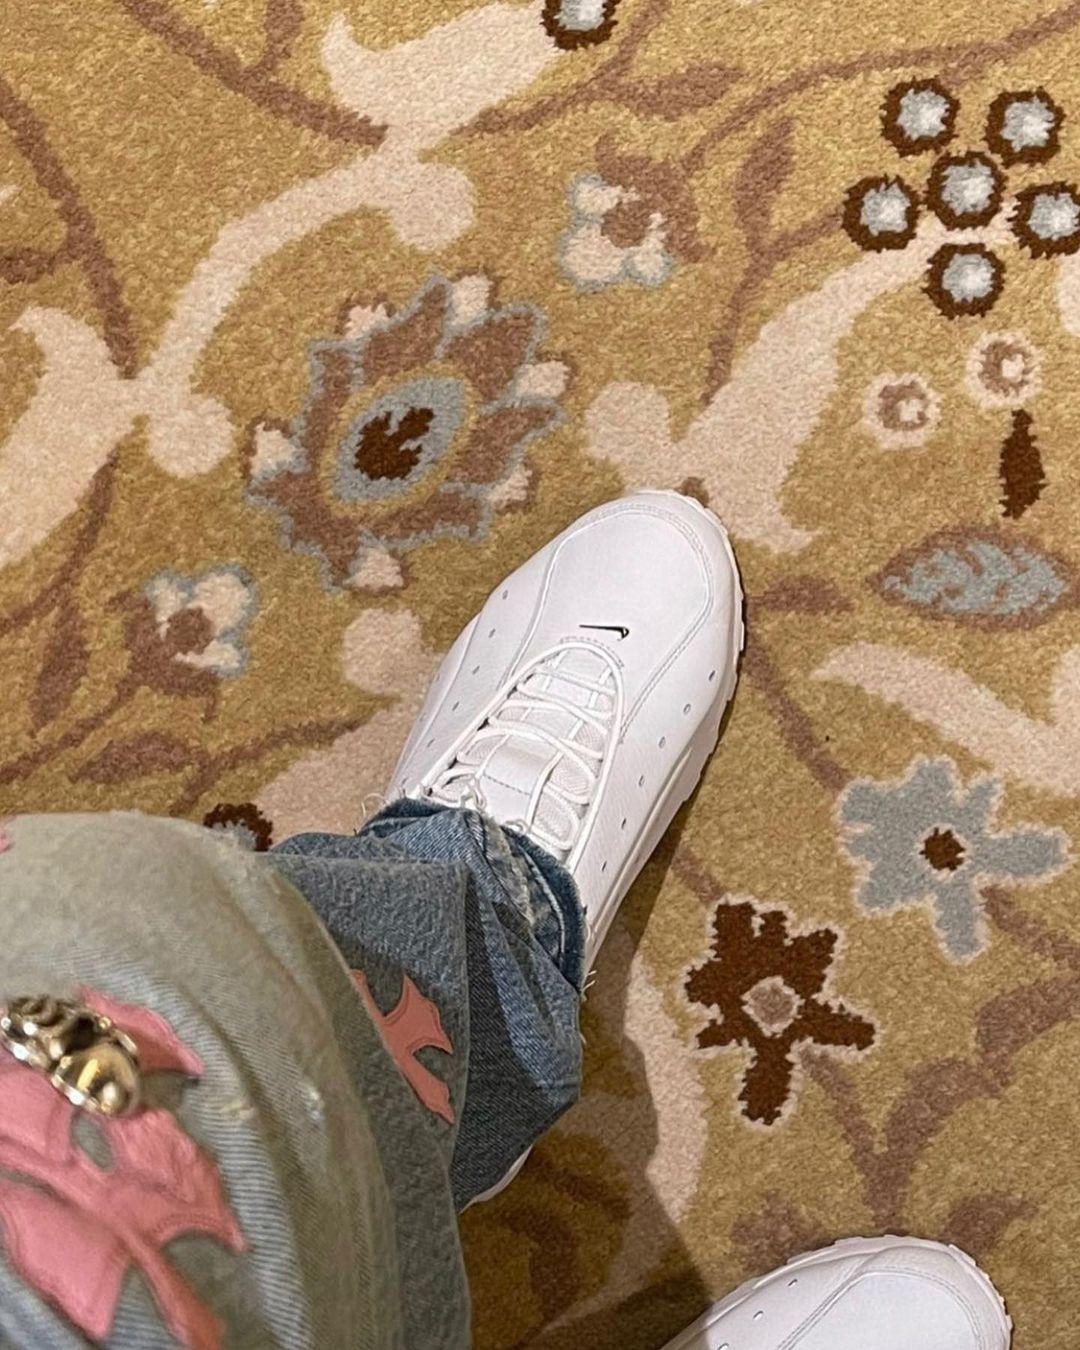 Drake teases a possible Nike X Nocta Sneaker